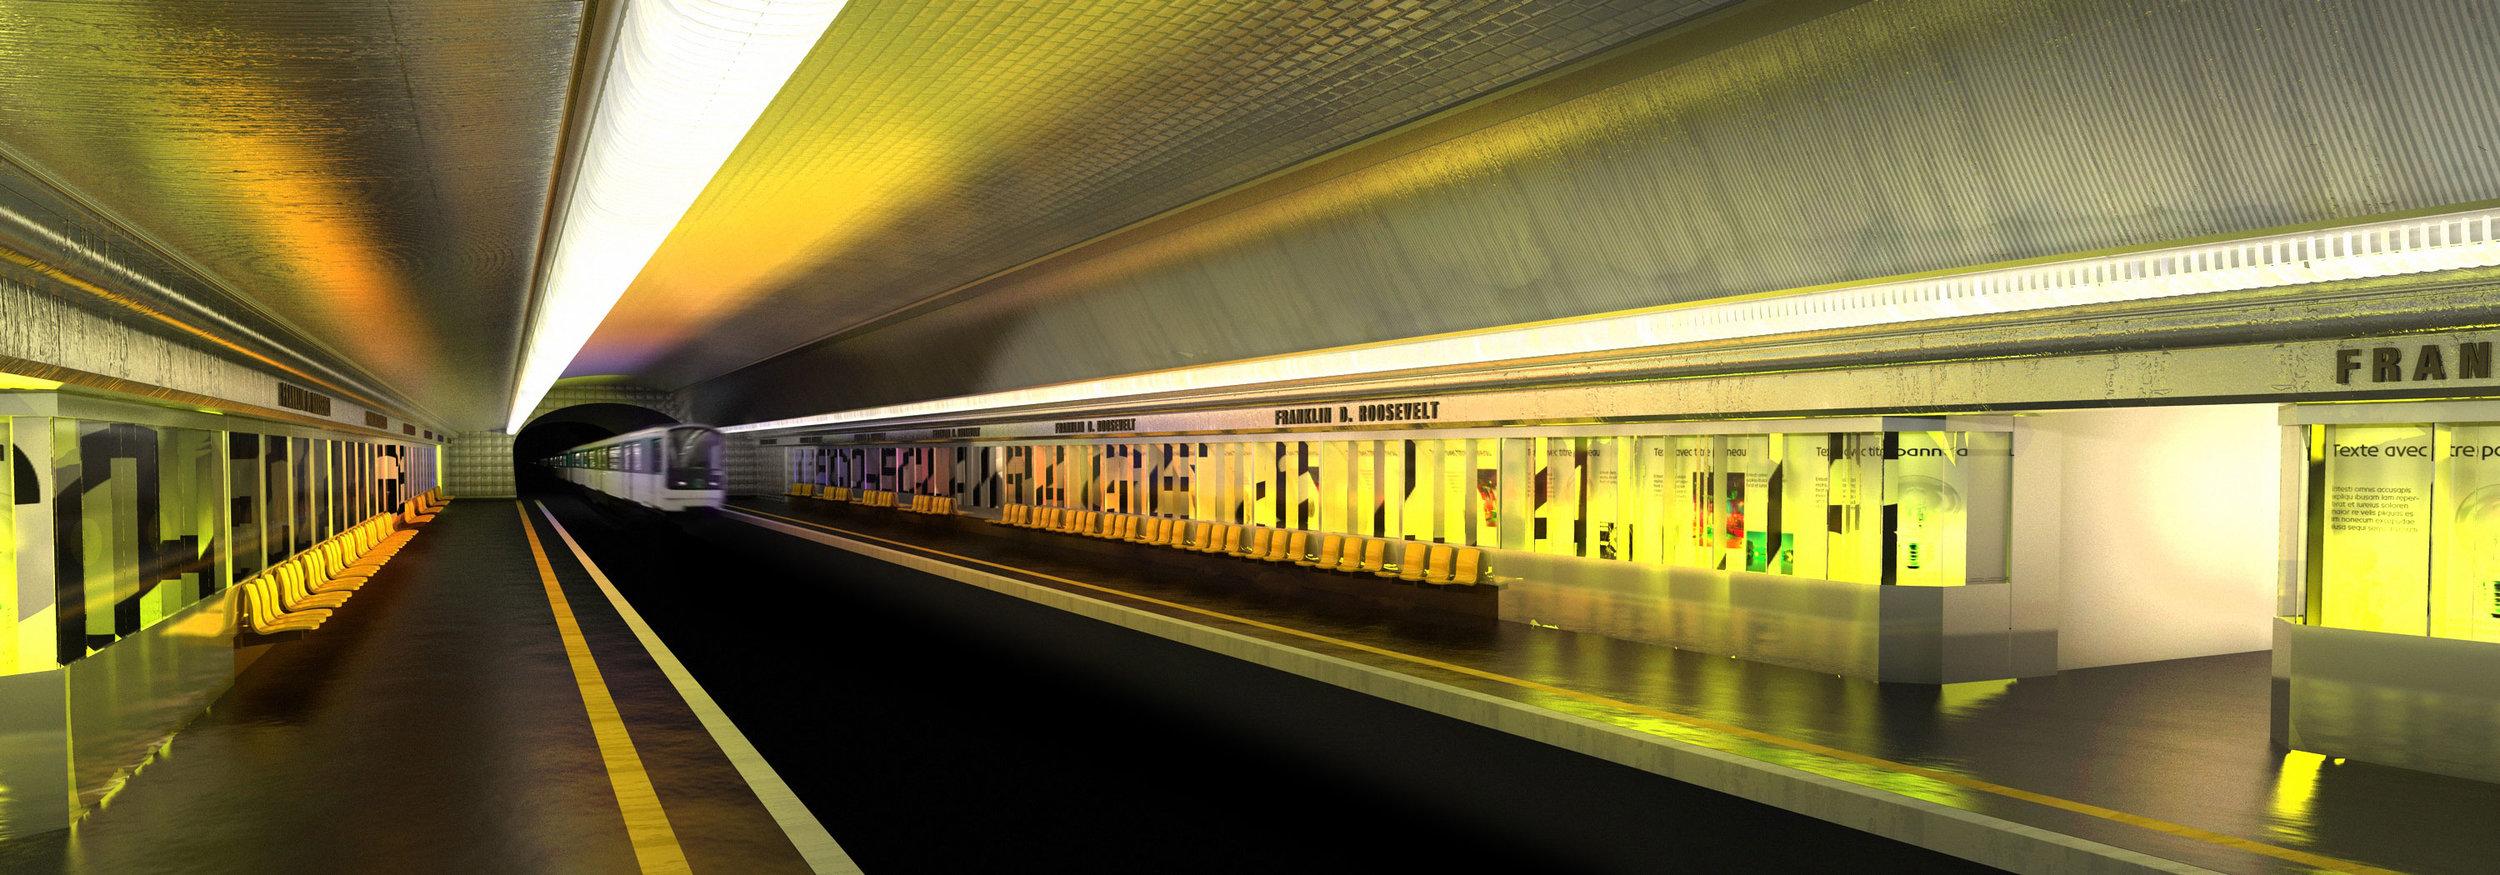 scenographie-evenement-ephemre-RATP-agence-narrative.jpg